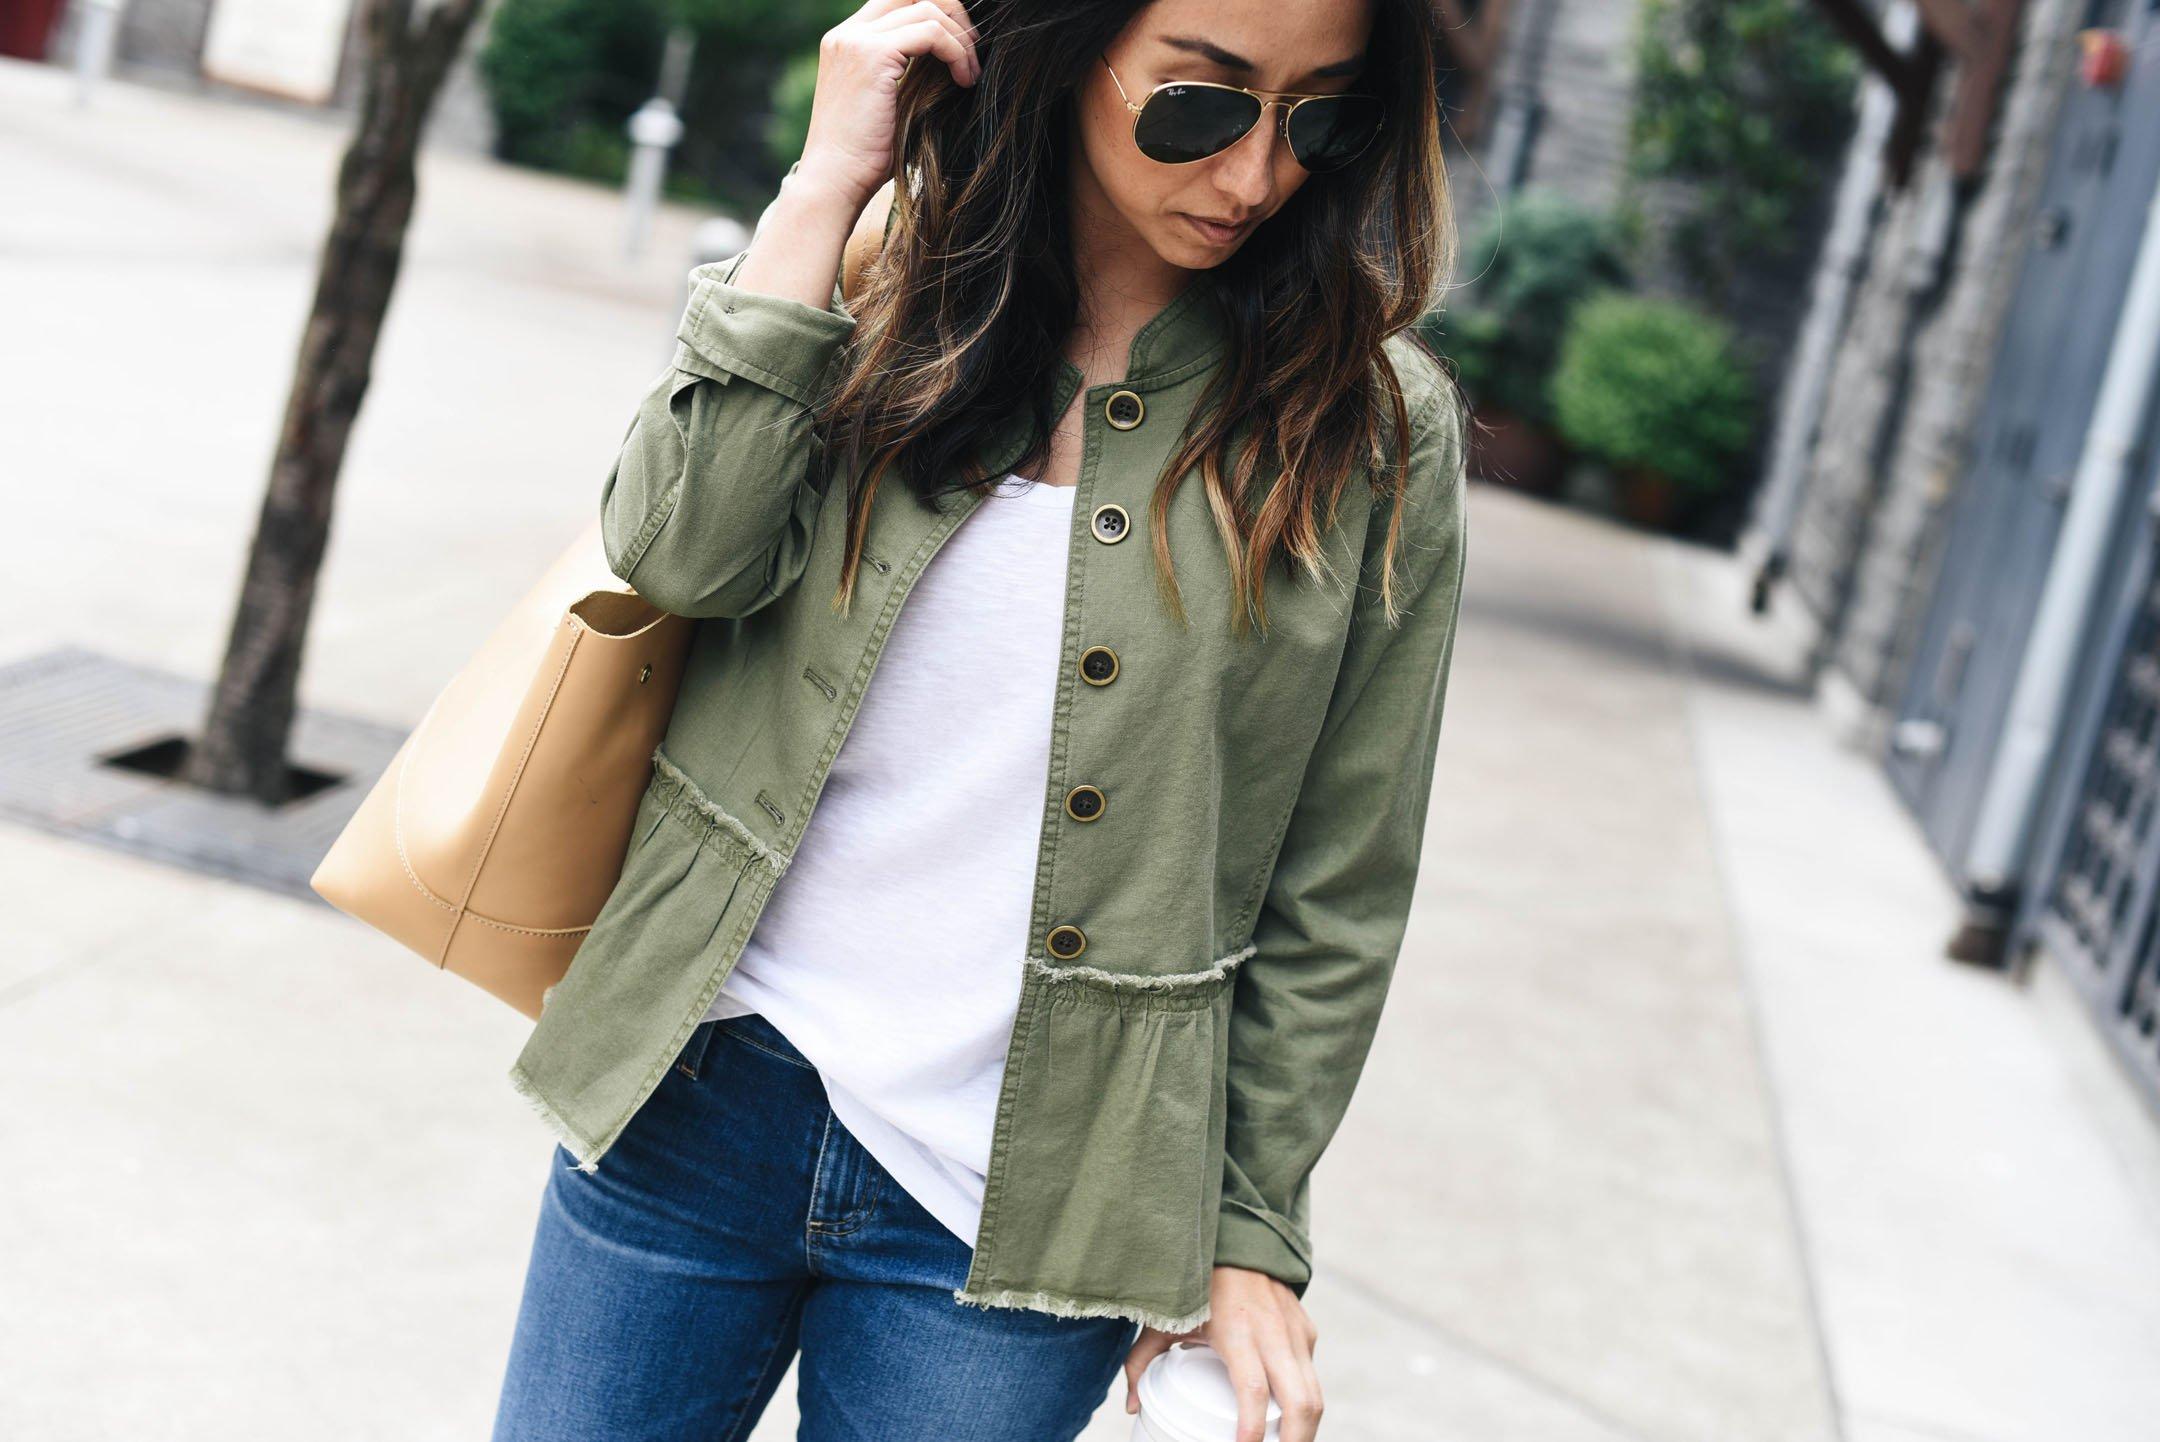 Caslon twill peplum jacket 2